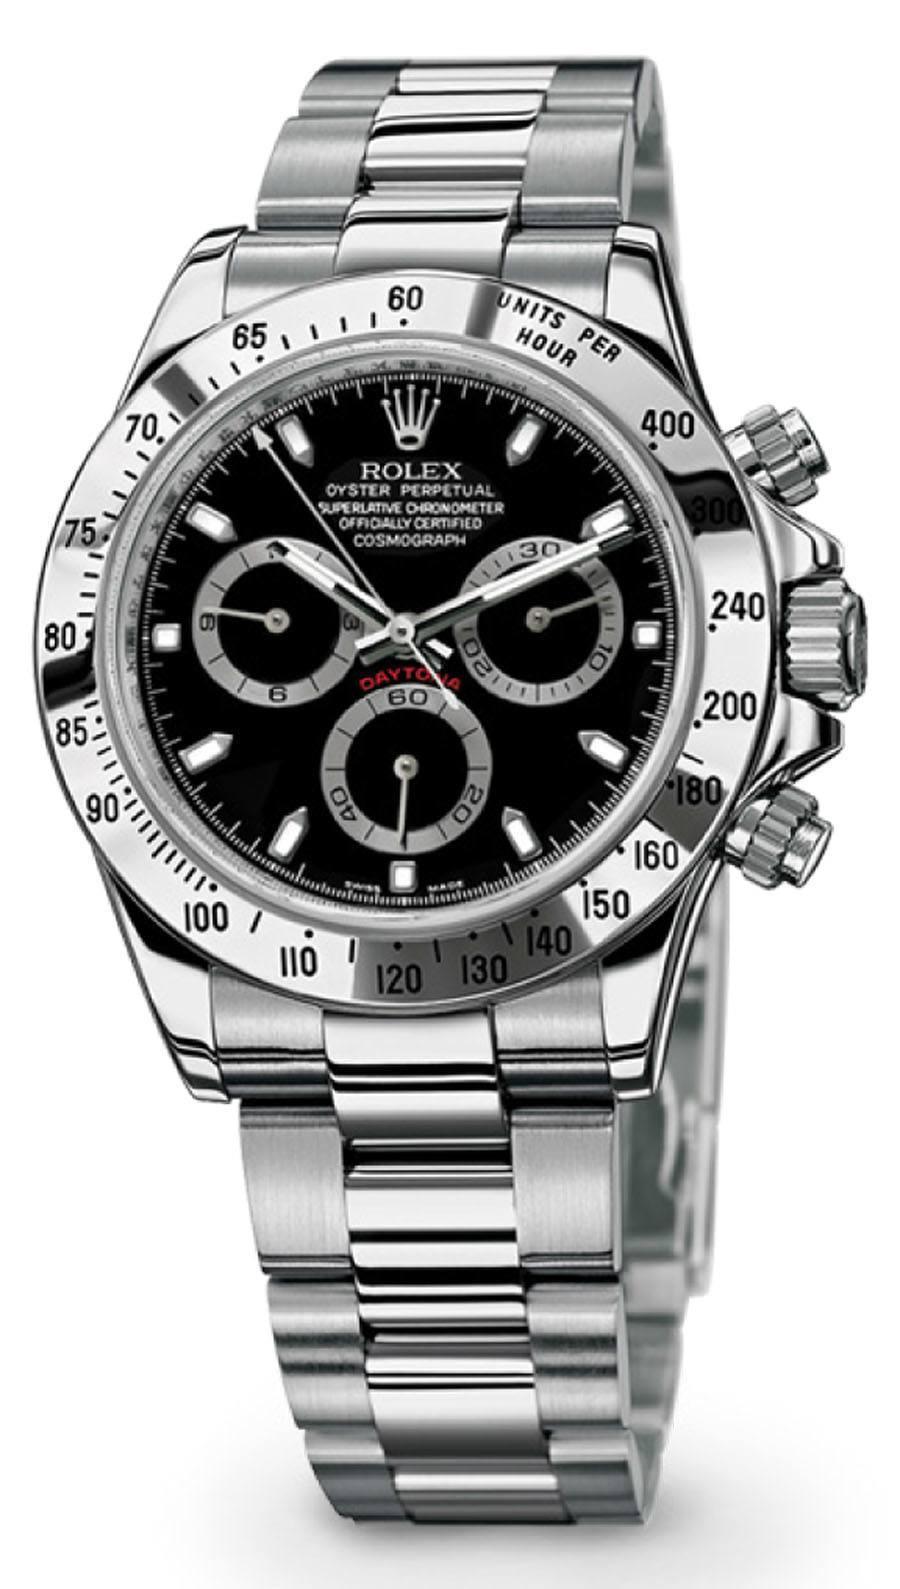 Rolex-Cosmograph-Daytona-Edelstahl-Uhrenrevision